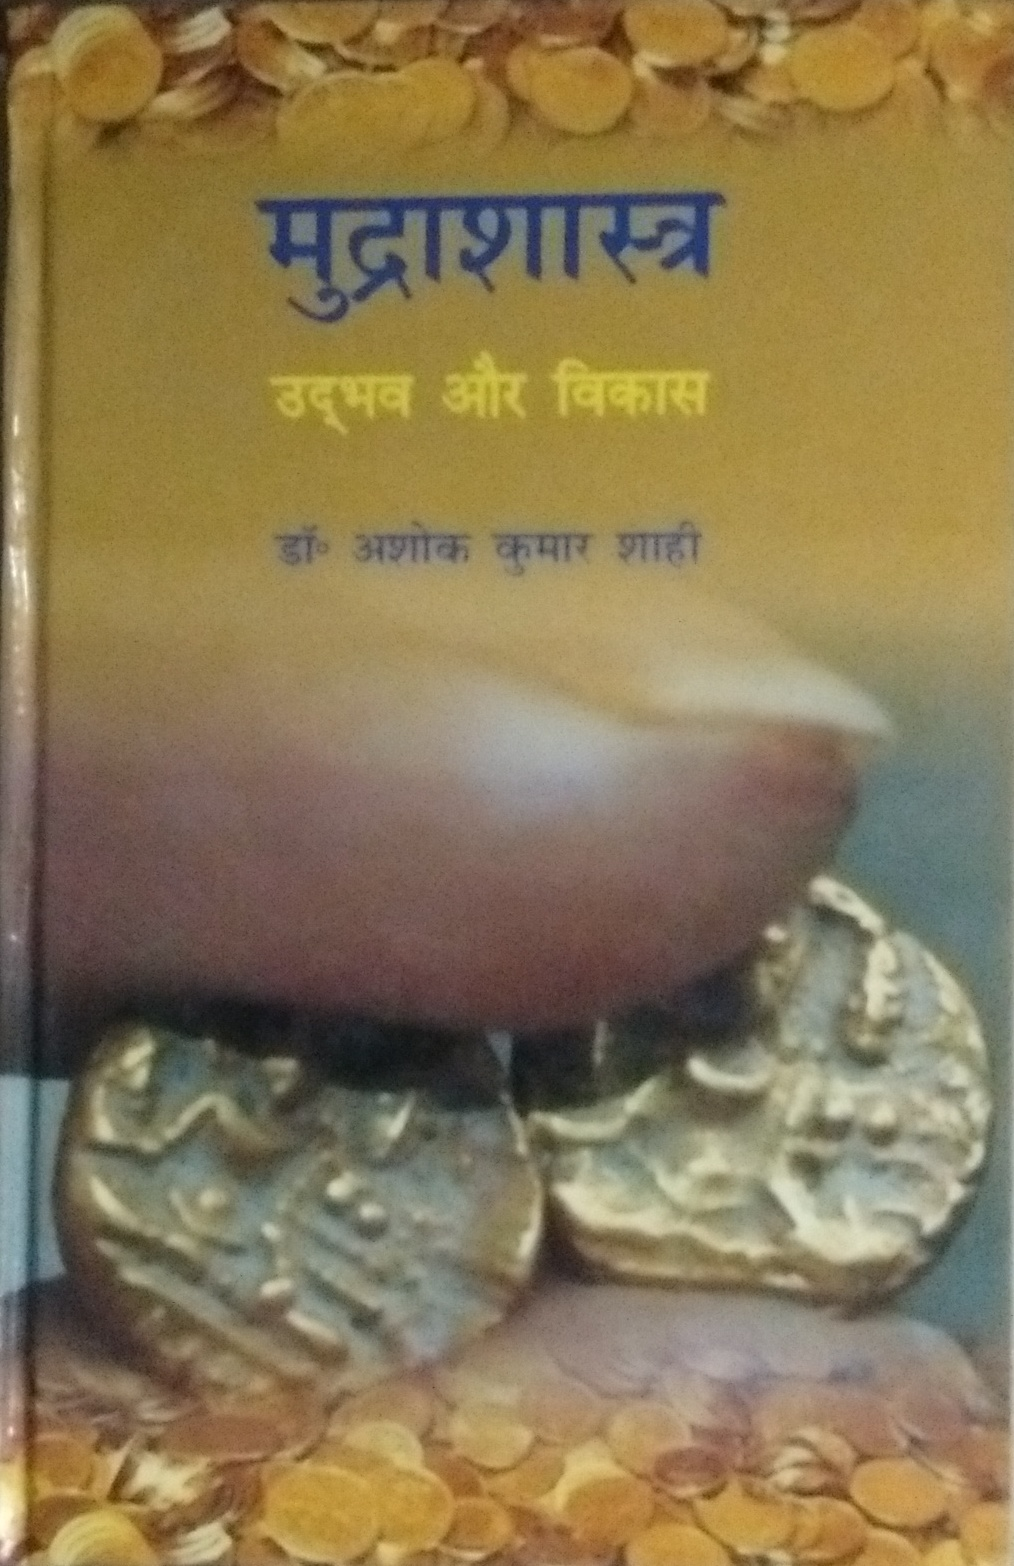 Mudrasastra: Udgav aur Vikas (Hindi)